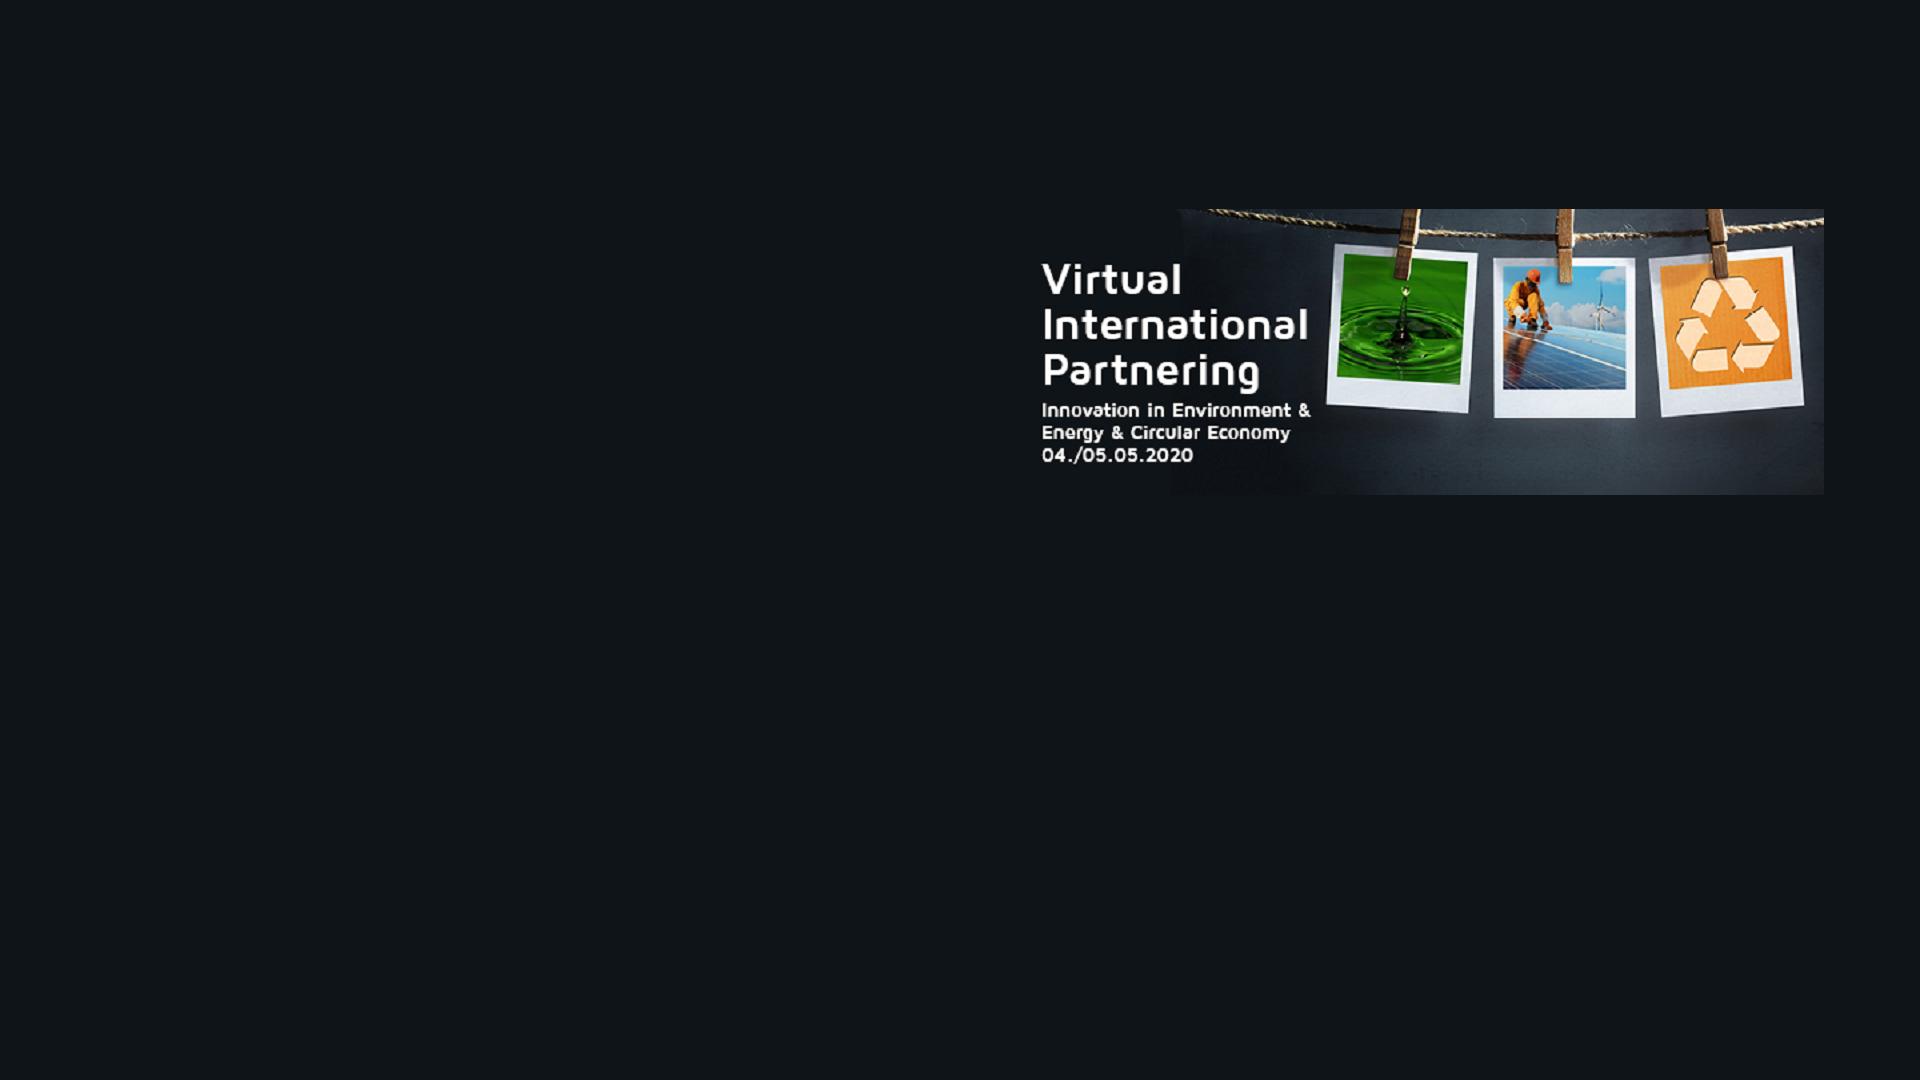 Virtual International Partnering – Innovation in Environment & Energy & Circular Economy